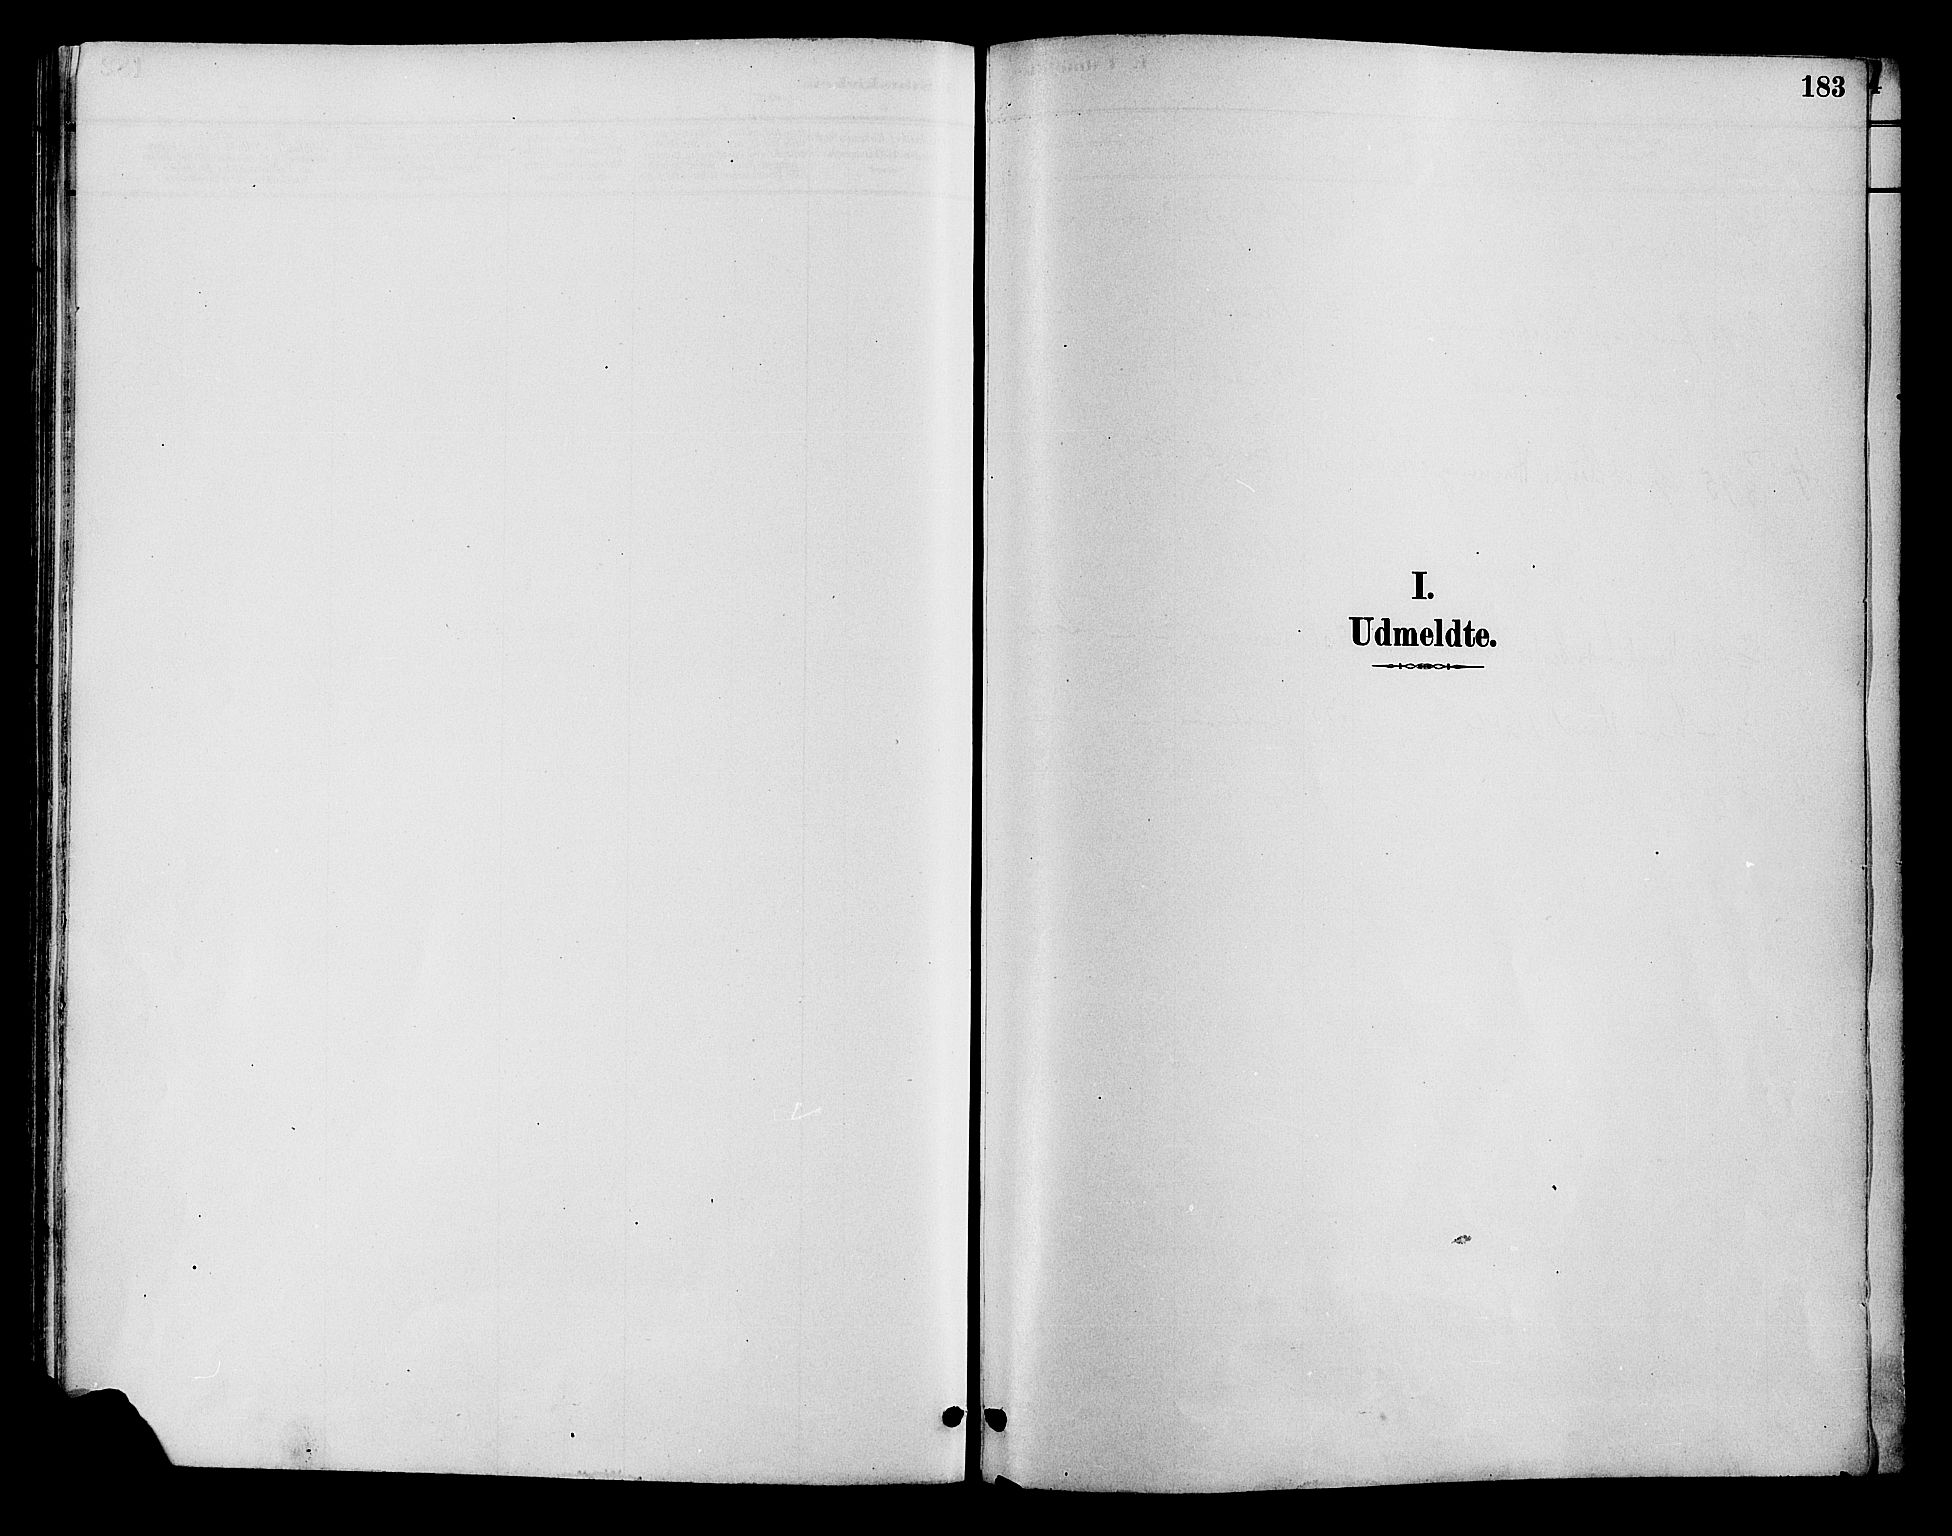 SAH, Lom prestekontor, K/L0008: Parish register (official) no. 8, 1885-1898, p. 183